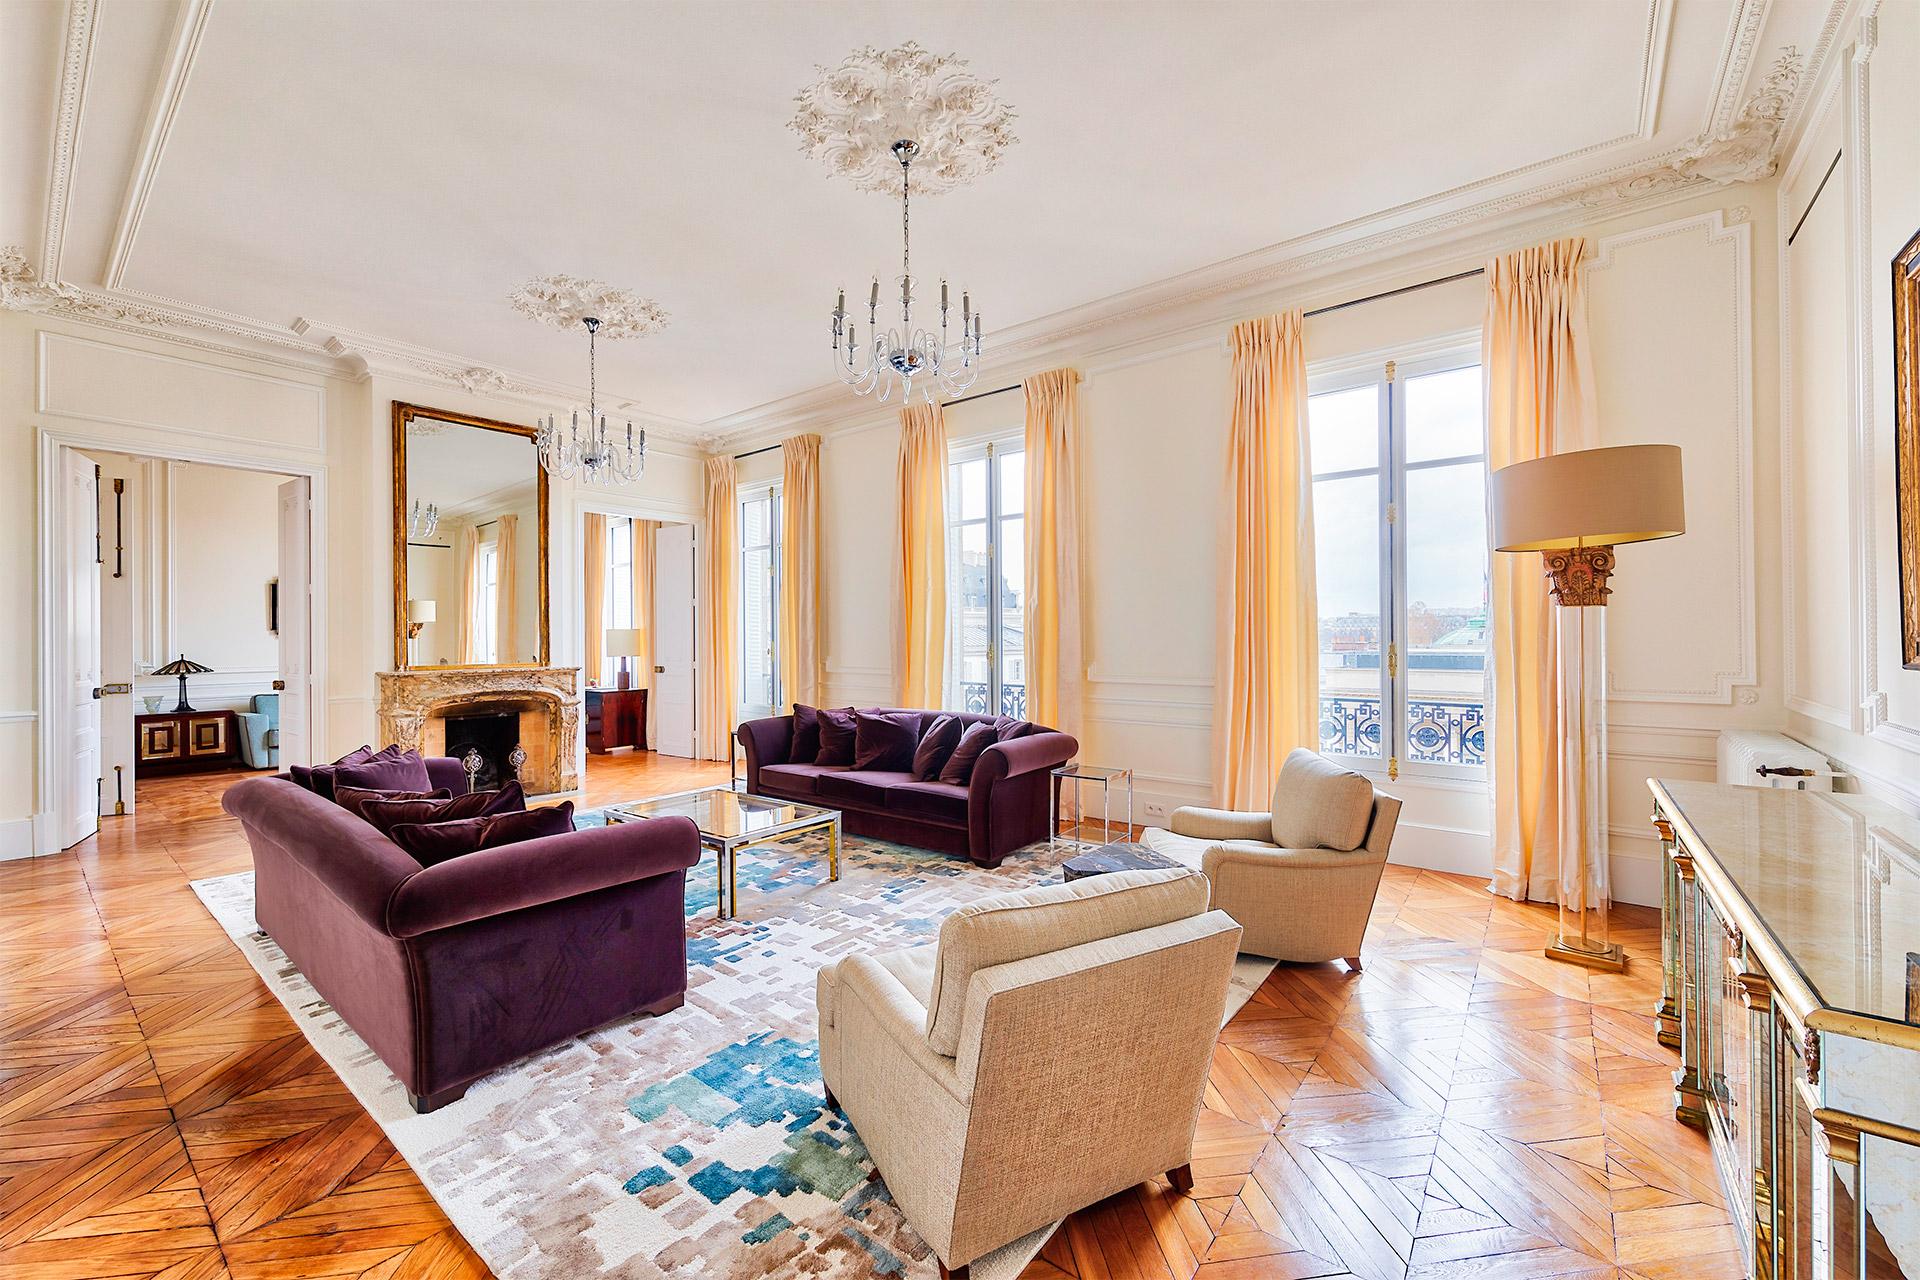 Magnificent 4 bed, 4 bath long term rental near Musée d'Orsay